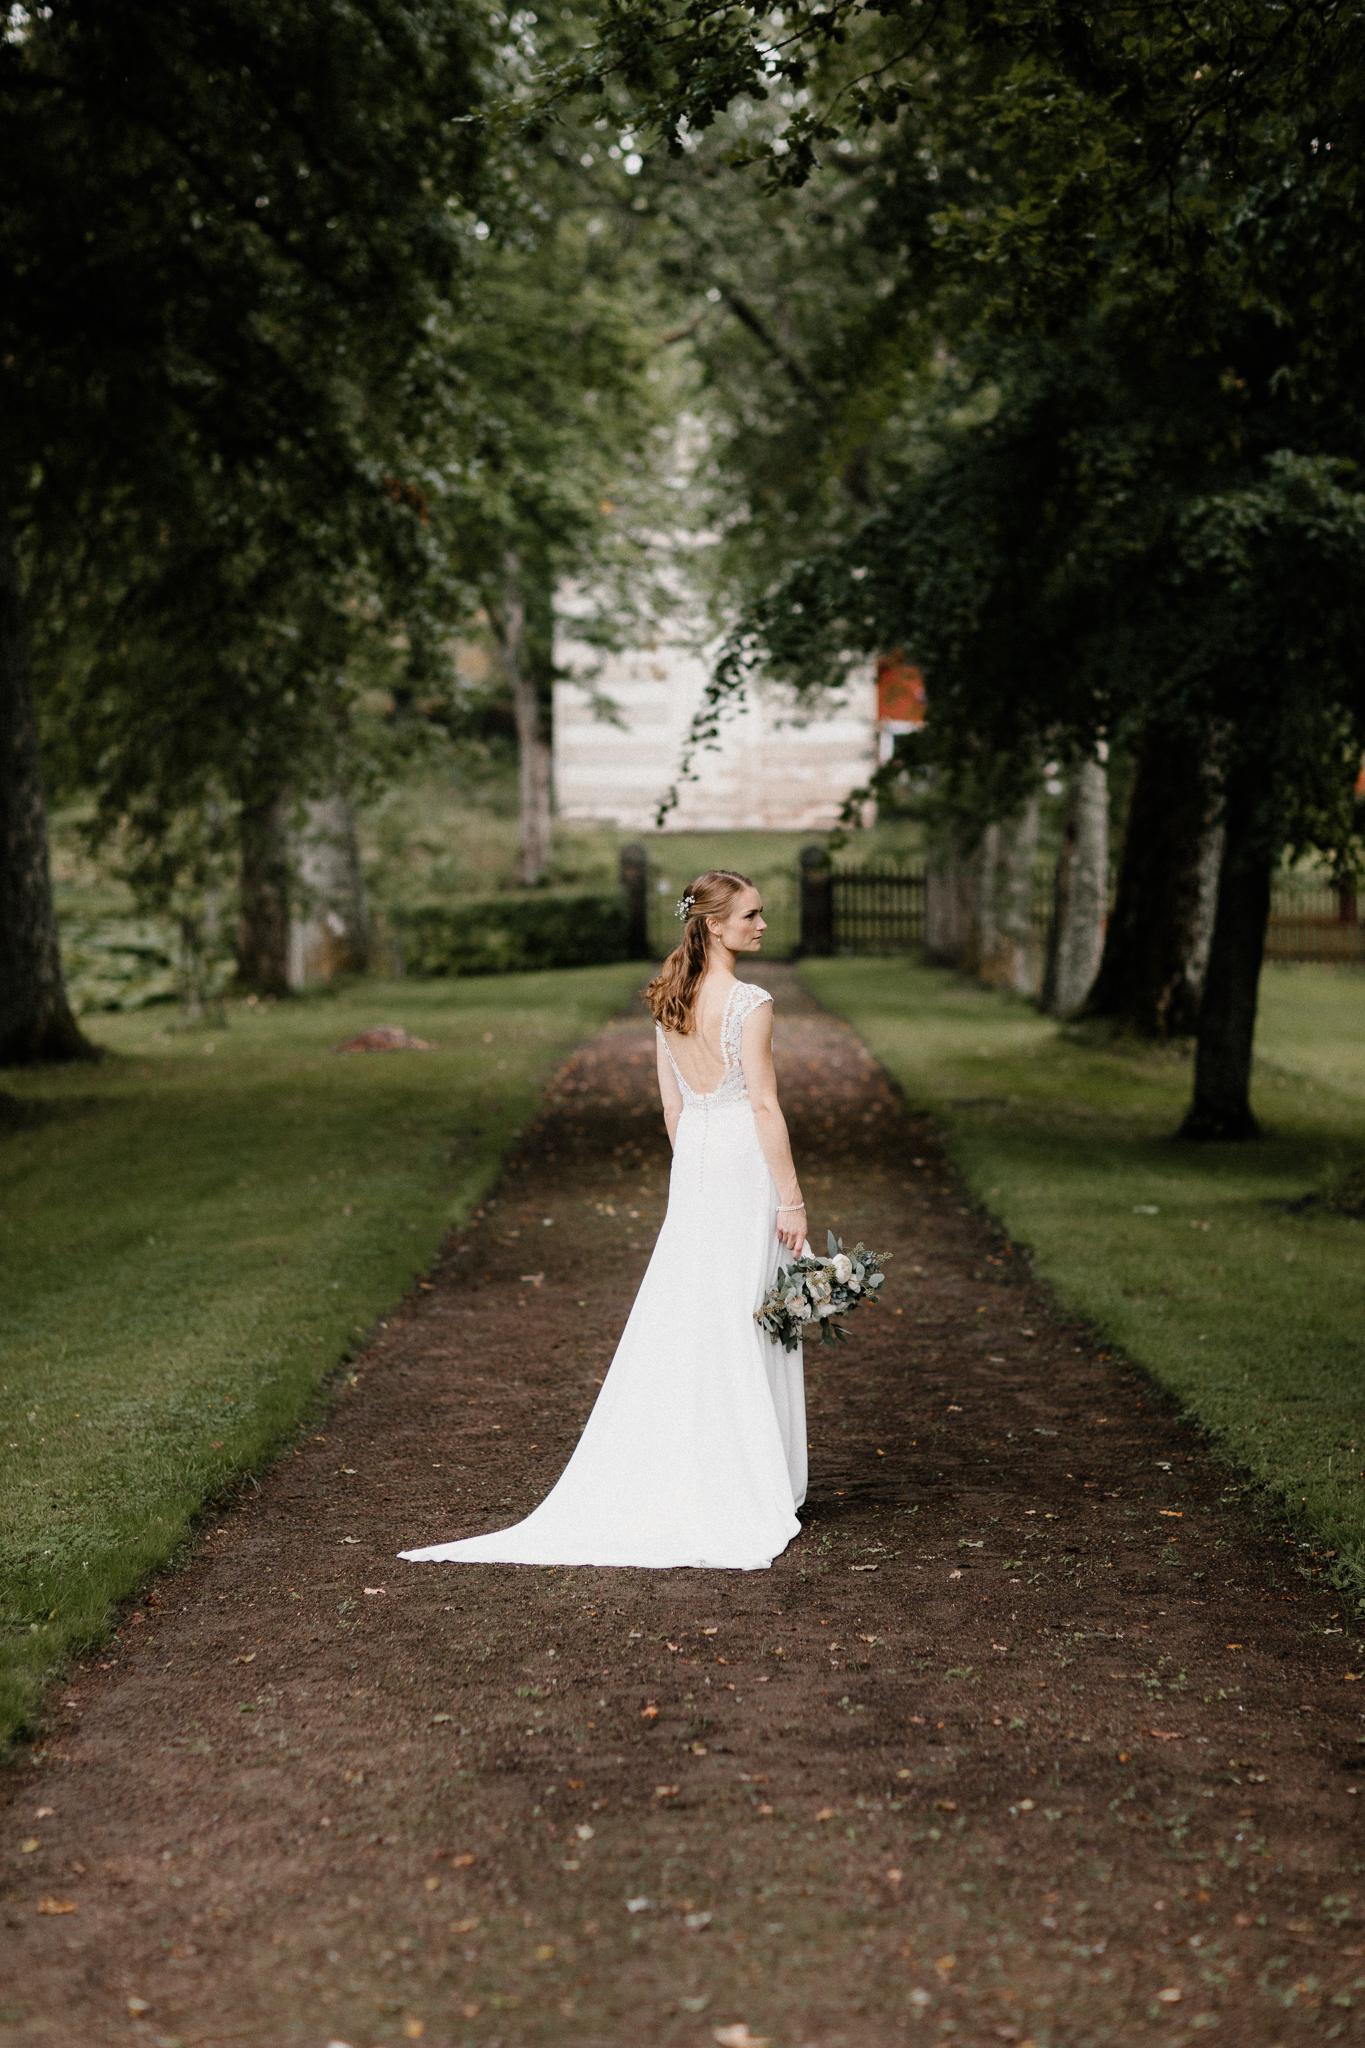 Jessica + Patrick | Fagervik | by Patrick Karkkolainen Wedding Photography-47.jpg